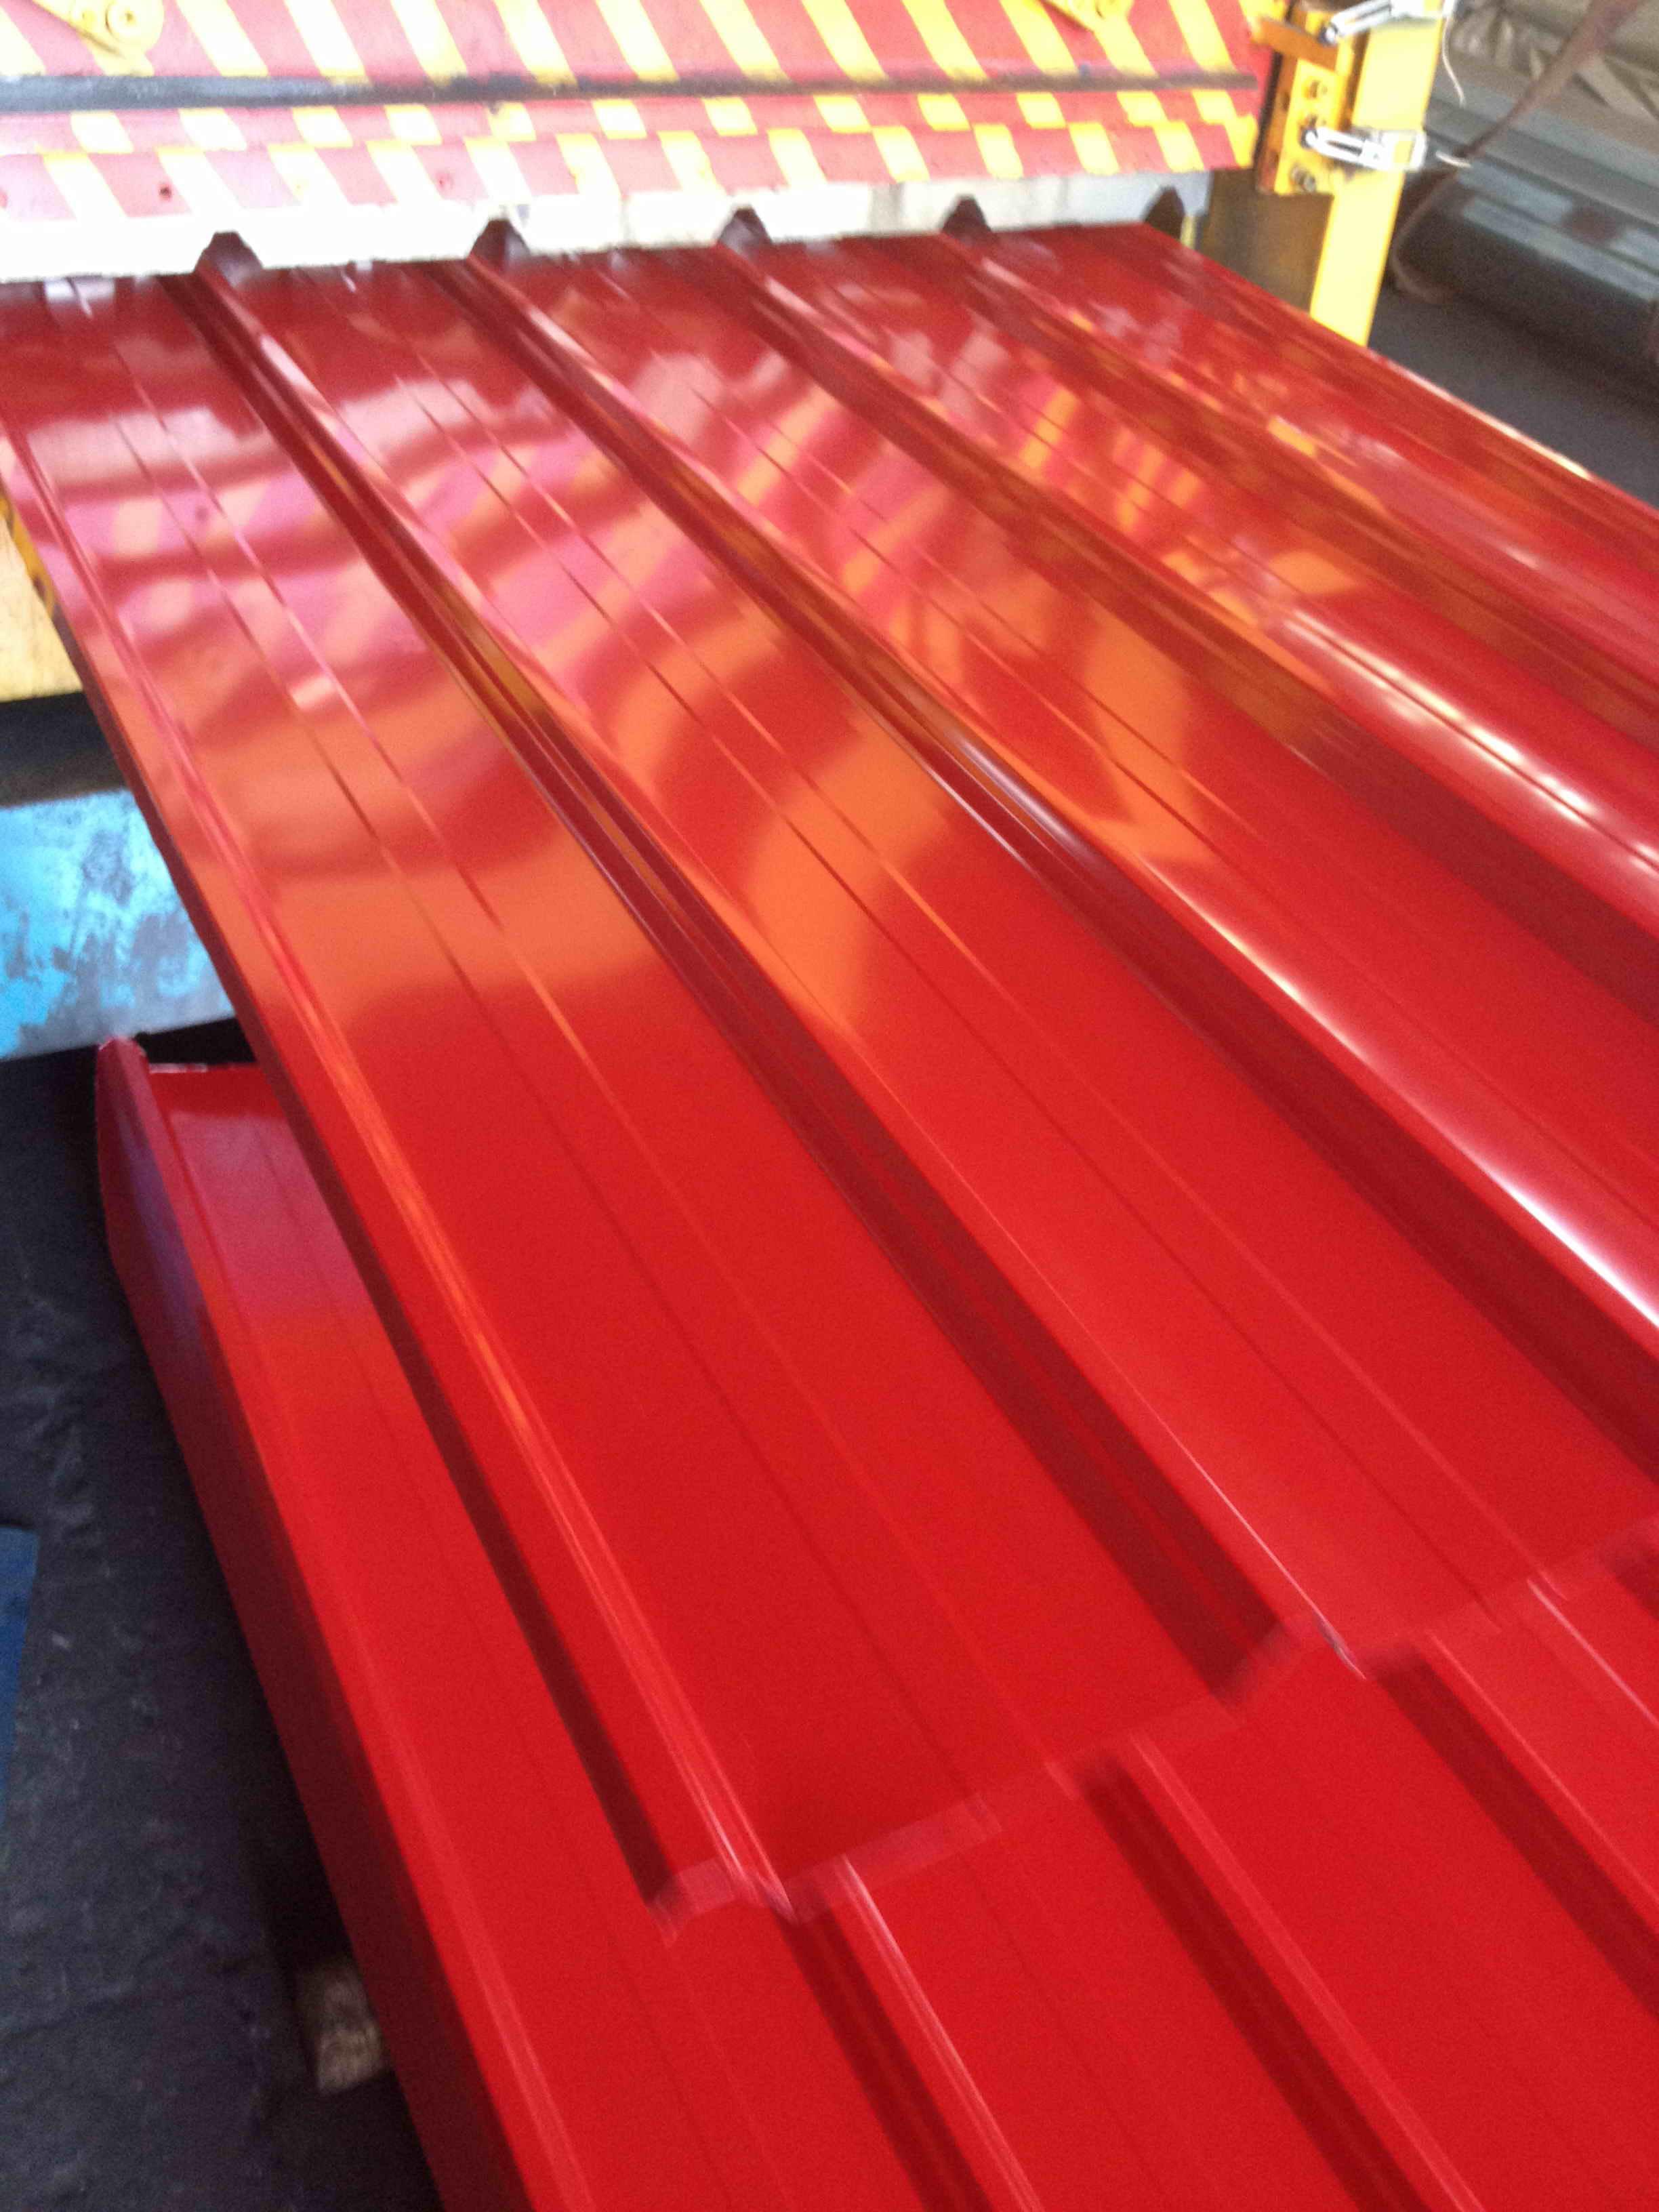 corrugated metal roofing sheet.jpg